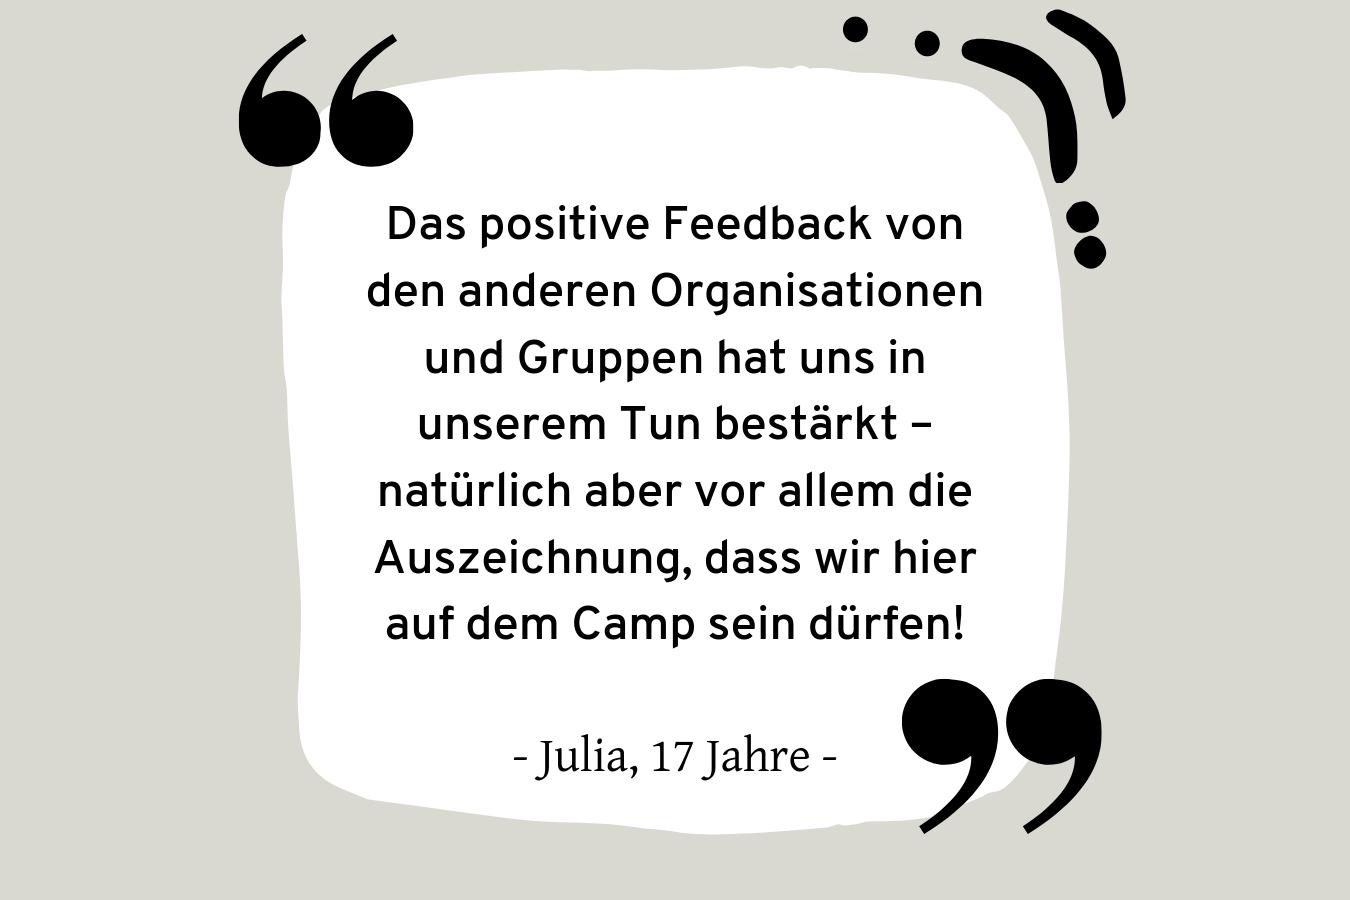 Zitat_Bildergalerie_Jugend_hilft!_Camp_2019 (28).png